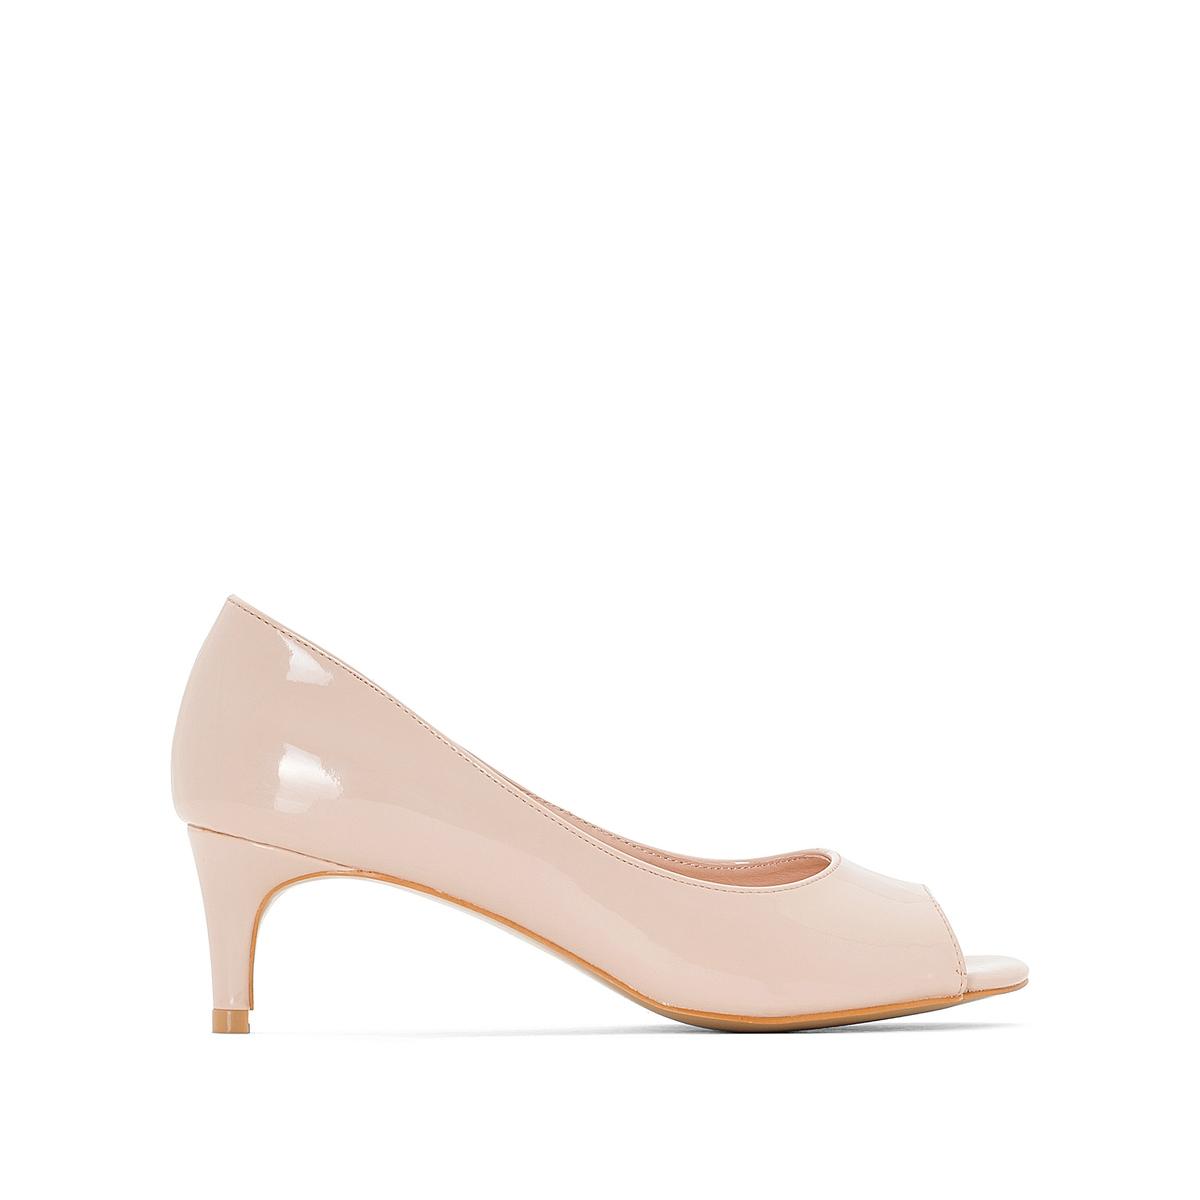 Туфли кожаные с открытым мыском anne weyburn